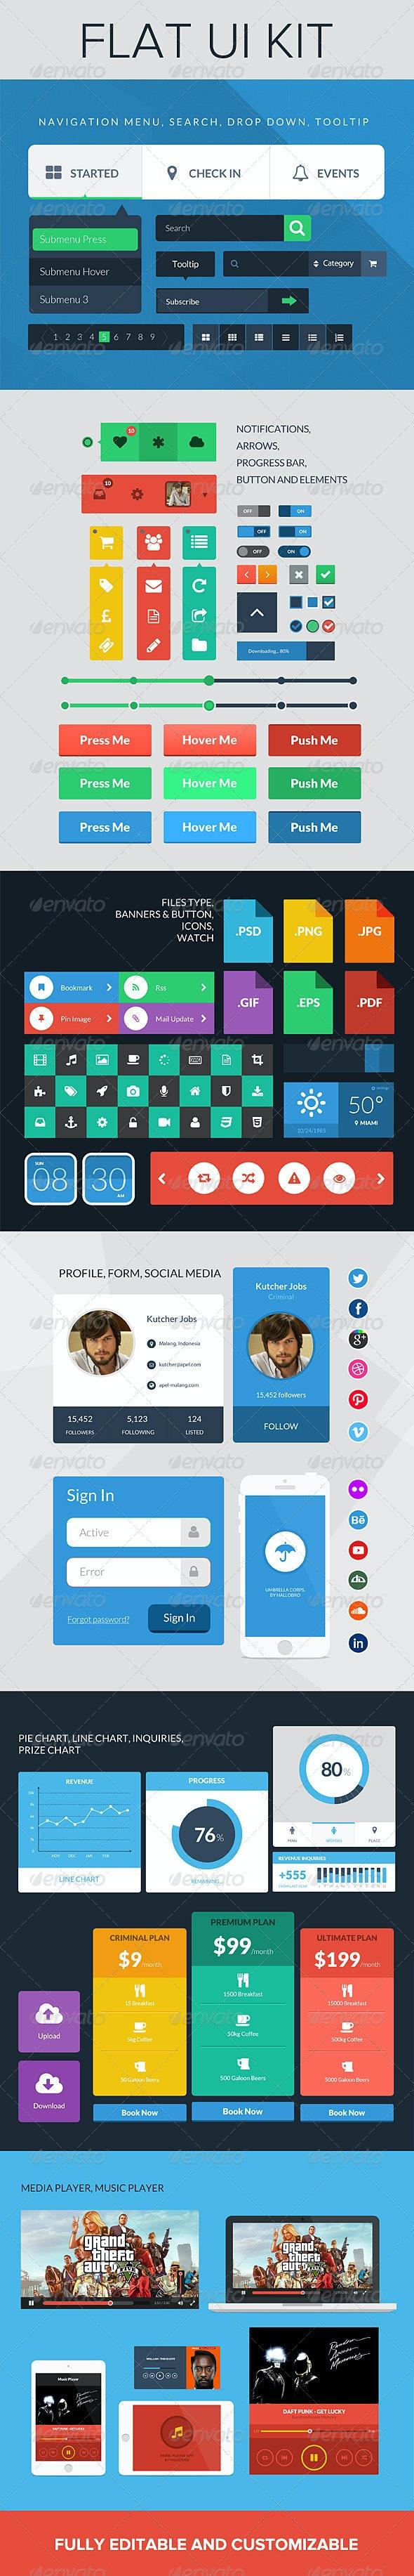 UI Kit - Flat Design - User Interfaces Web Elements